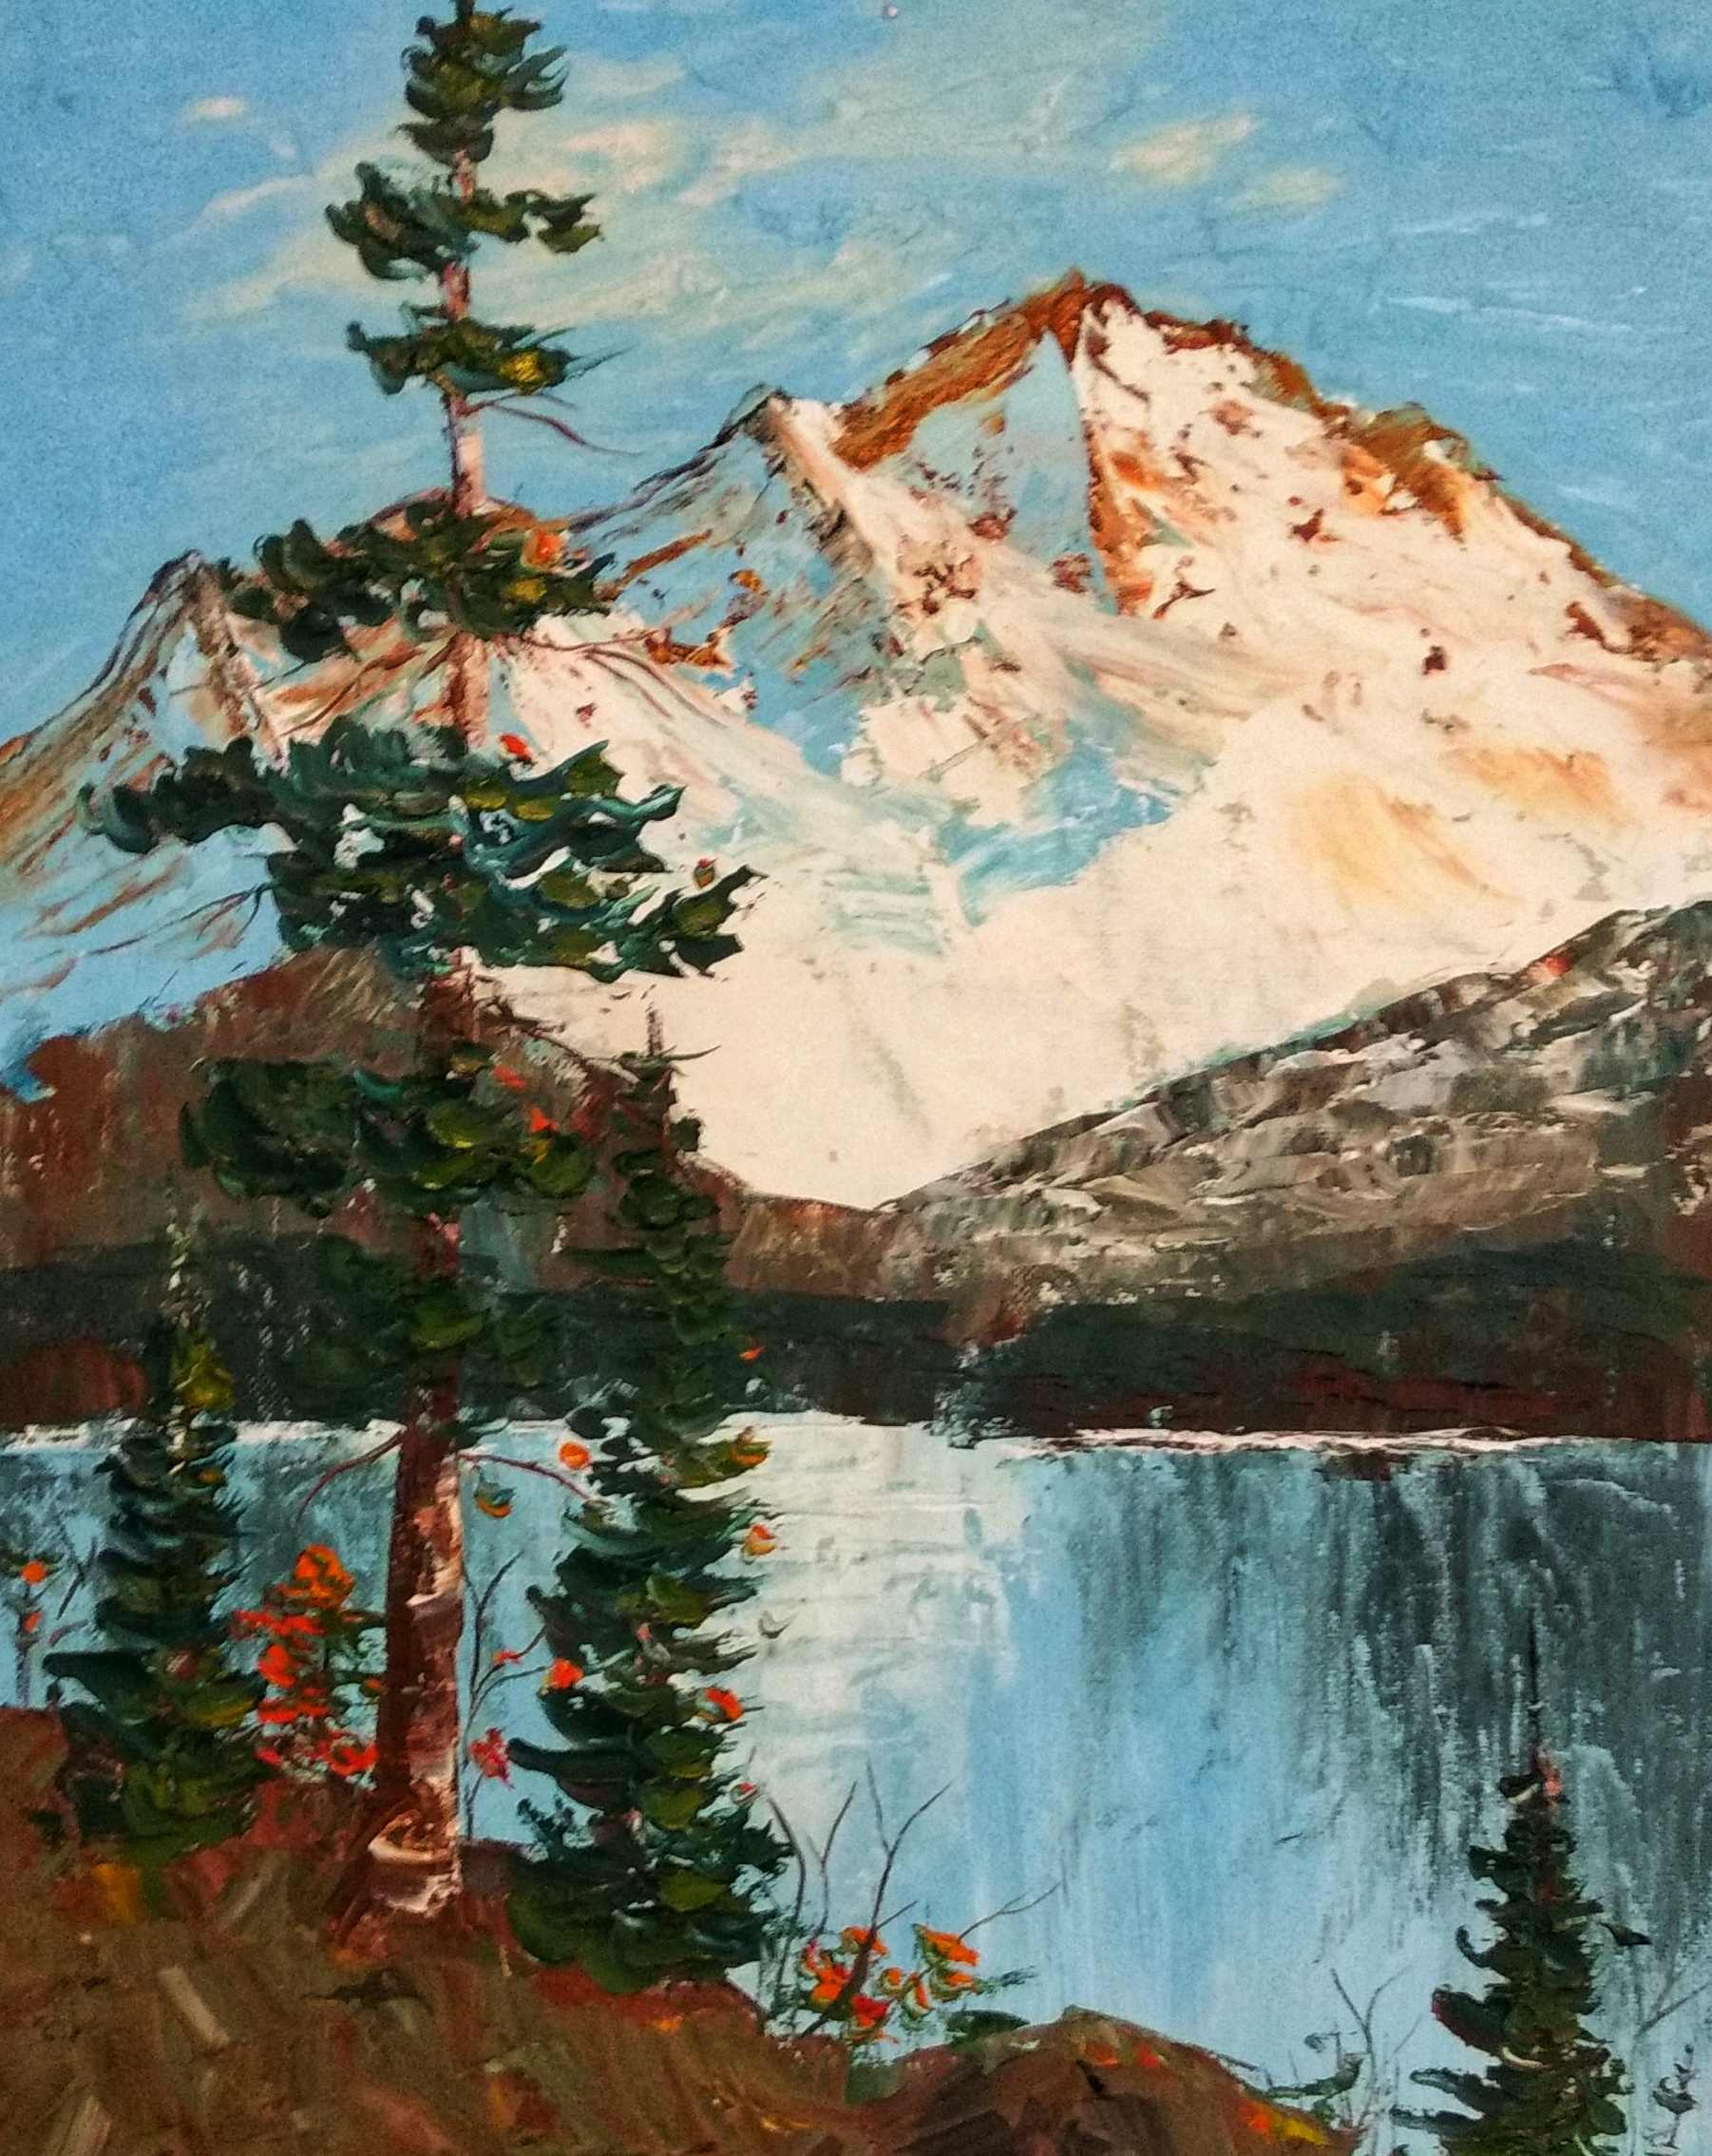 Landscape 1 - Oil